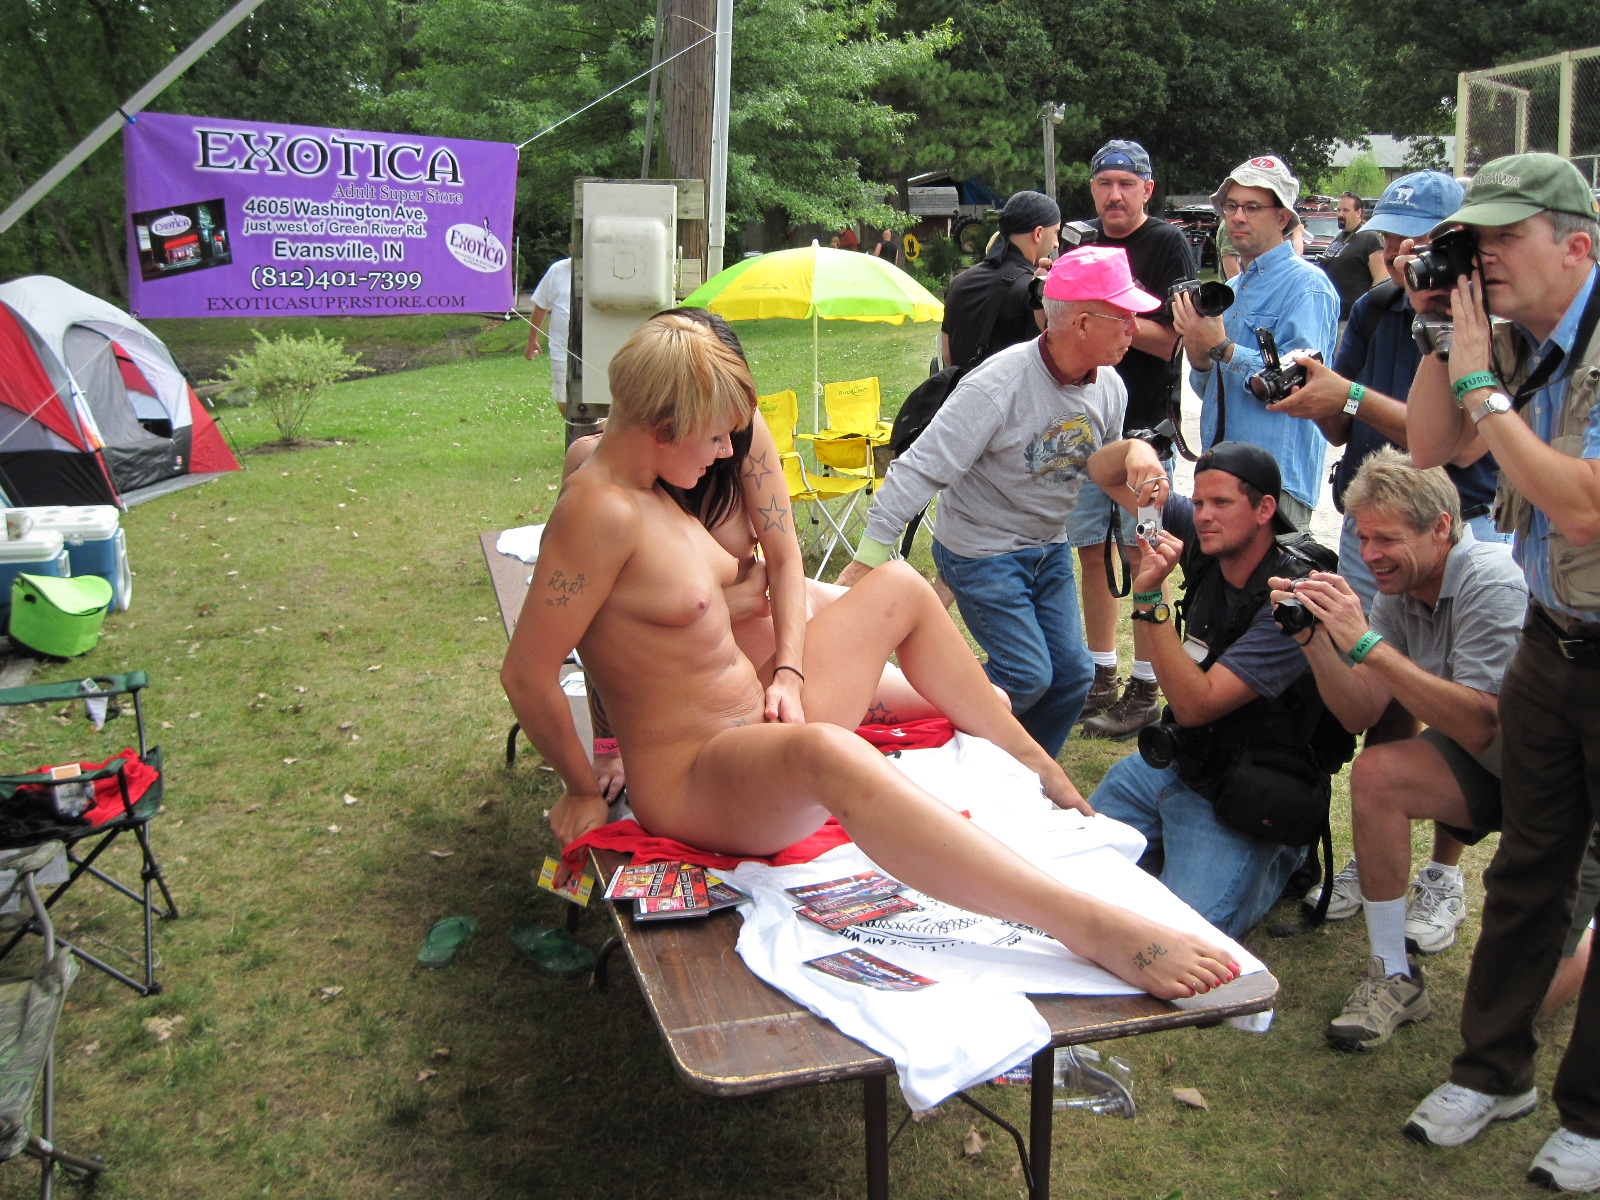 Description Nudes-A-Poppin 2009 0024.jpg